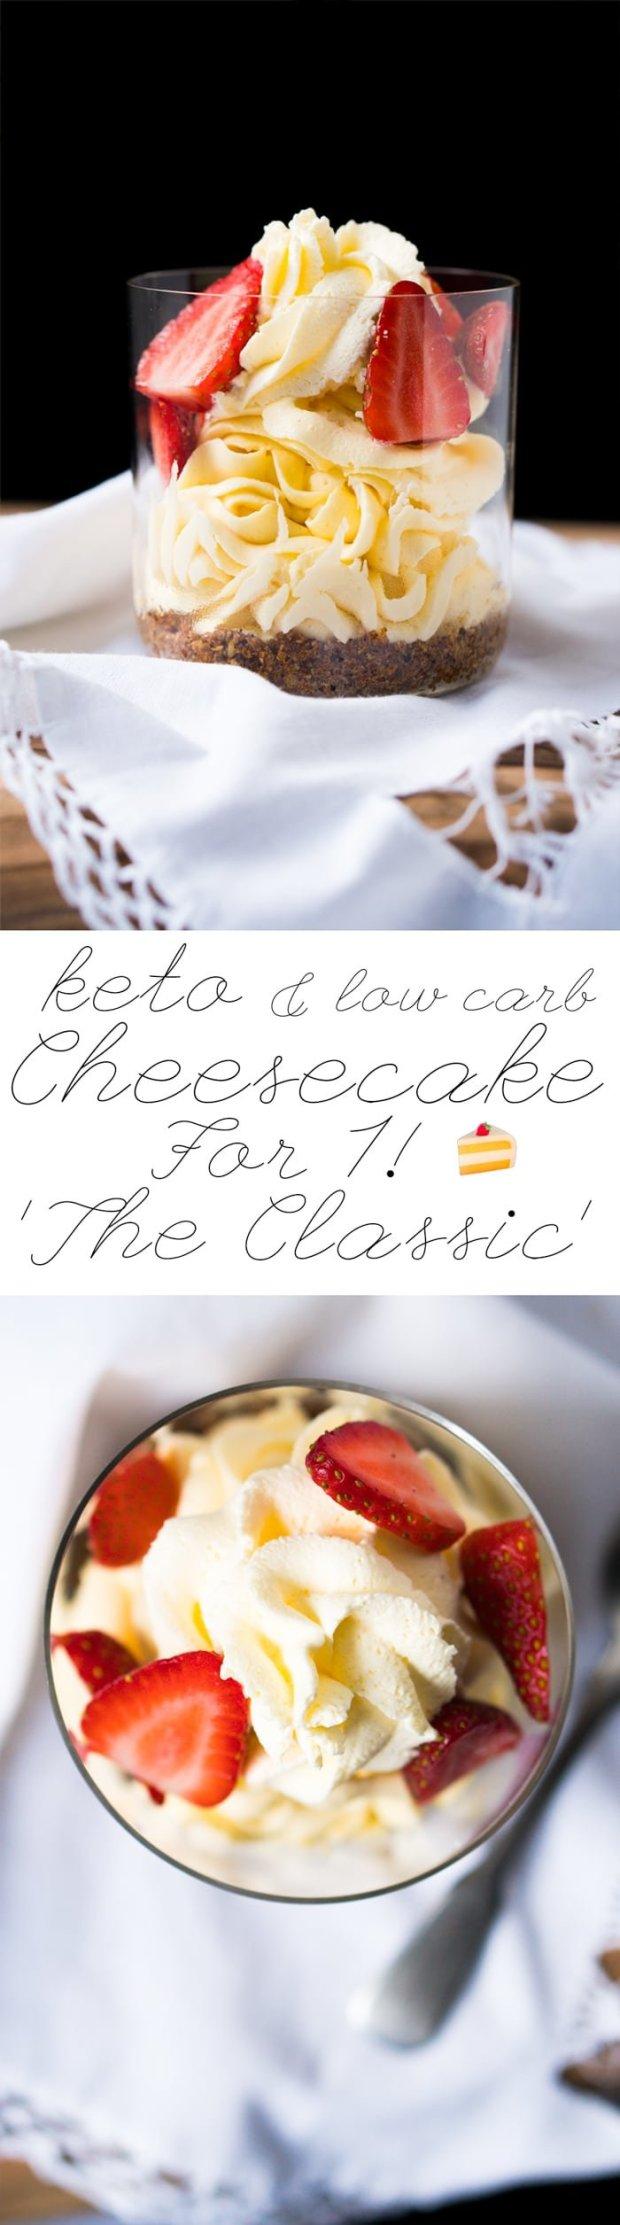 No-Bake Keto Cheesecake For 1! 🍰The Classic #ketocheesecake #lowcarbcheesecake